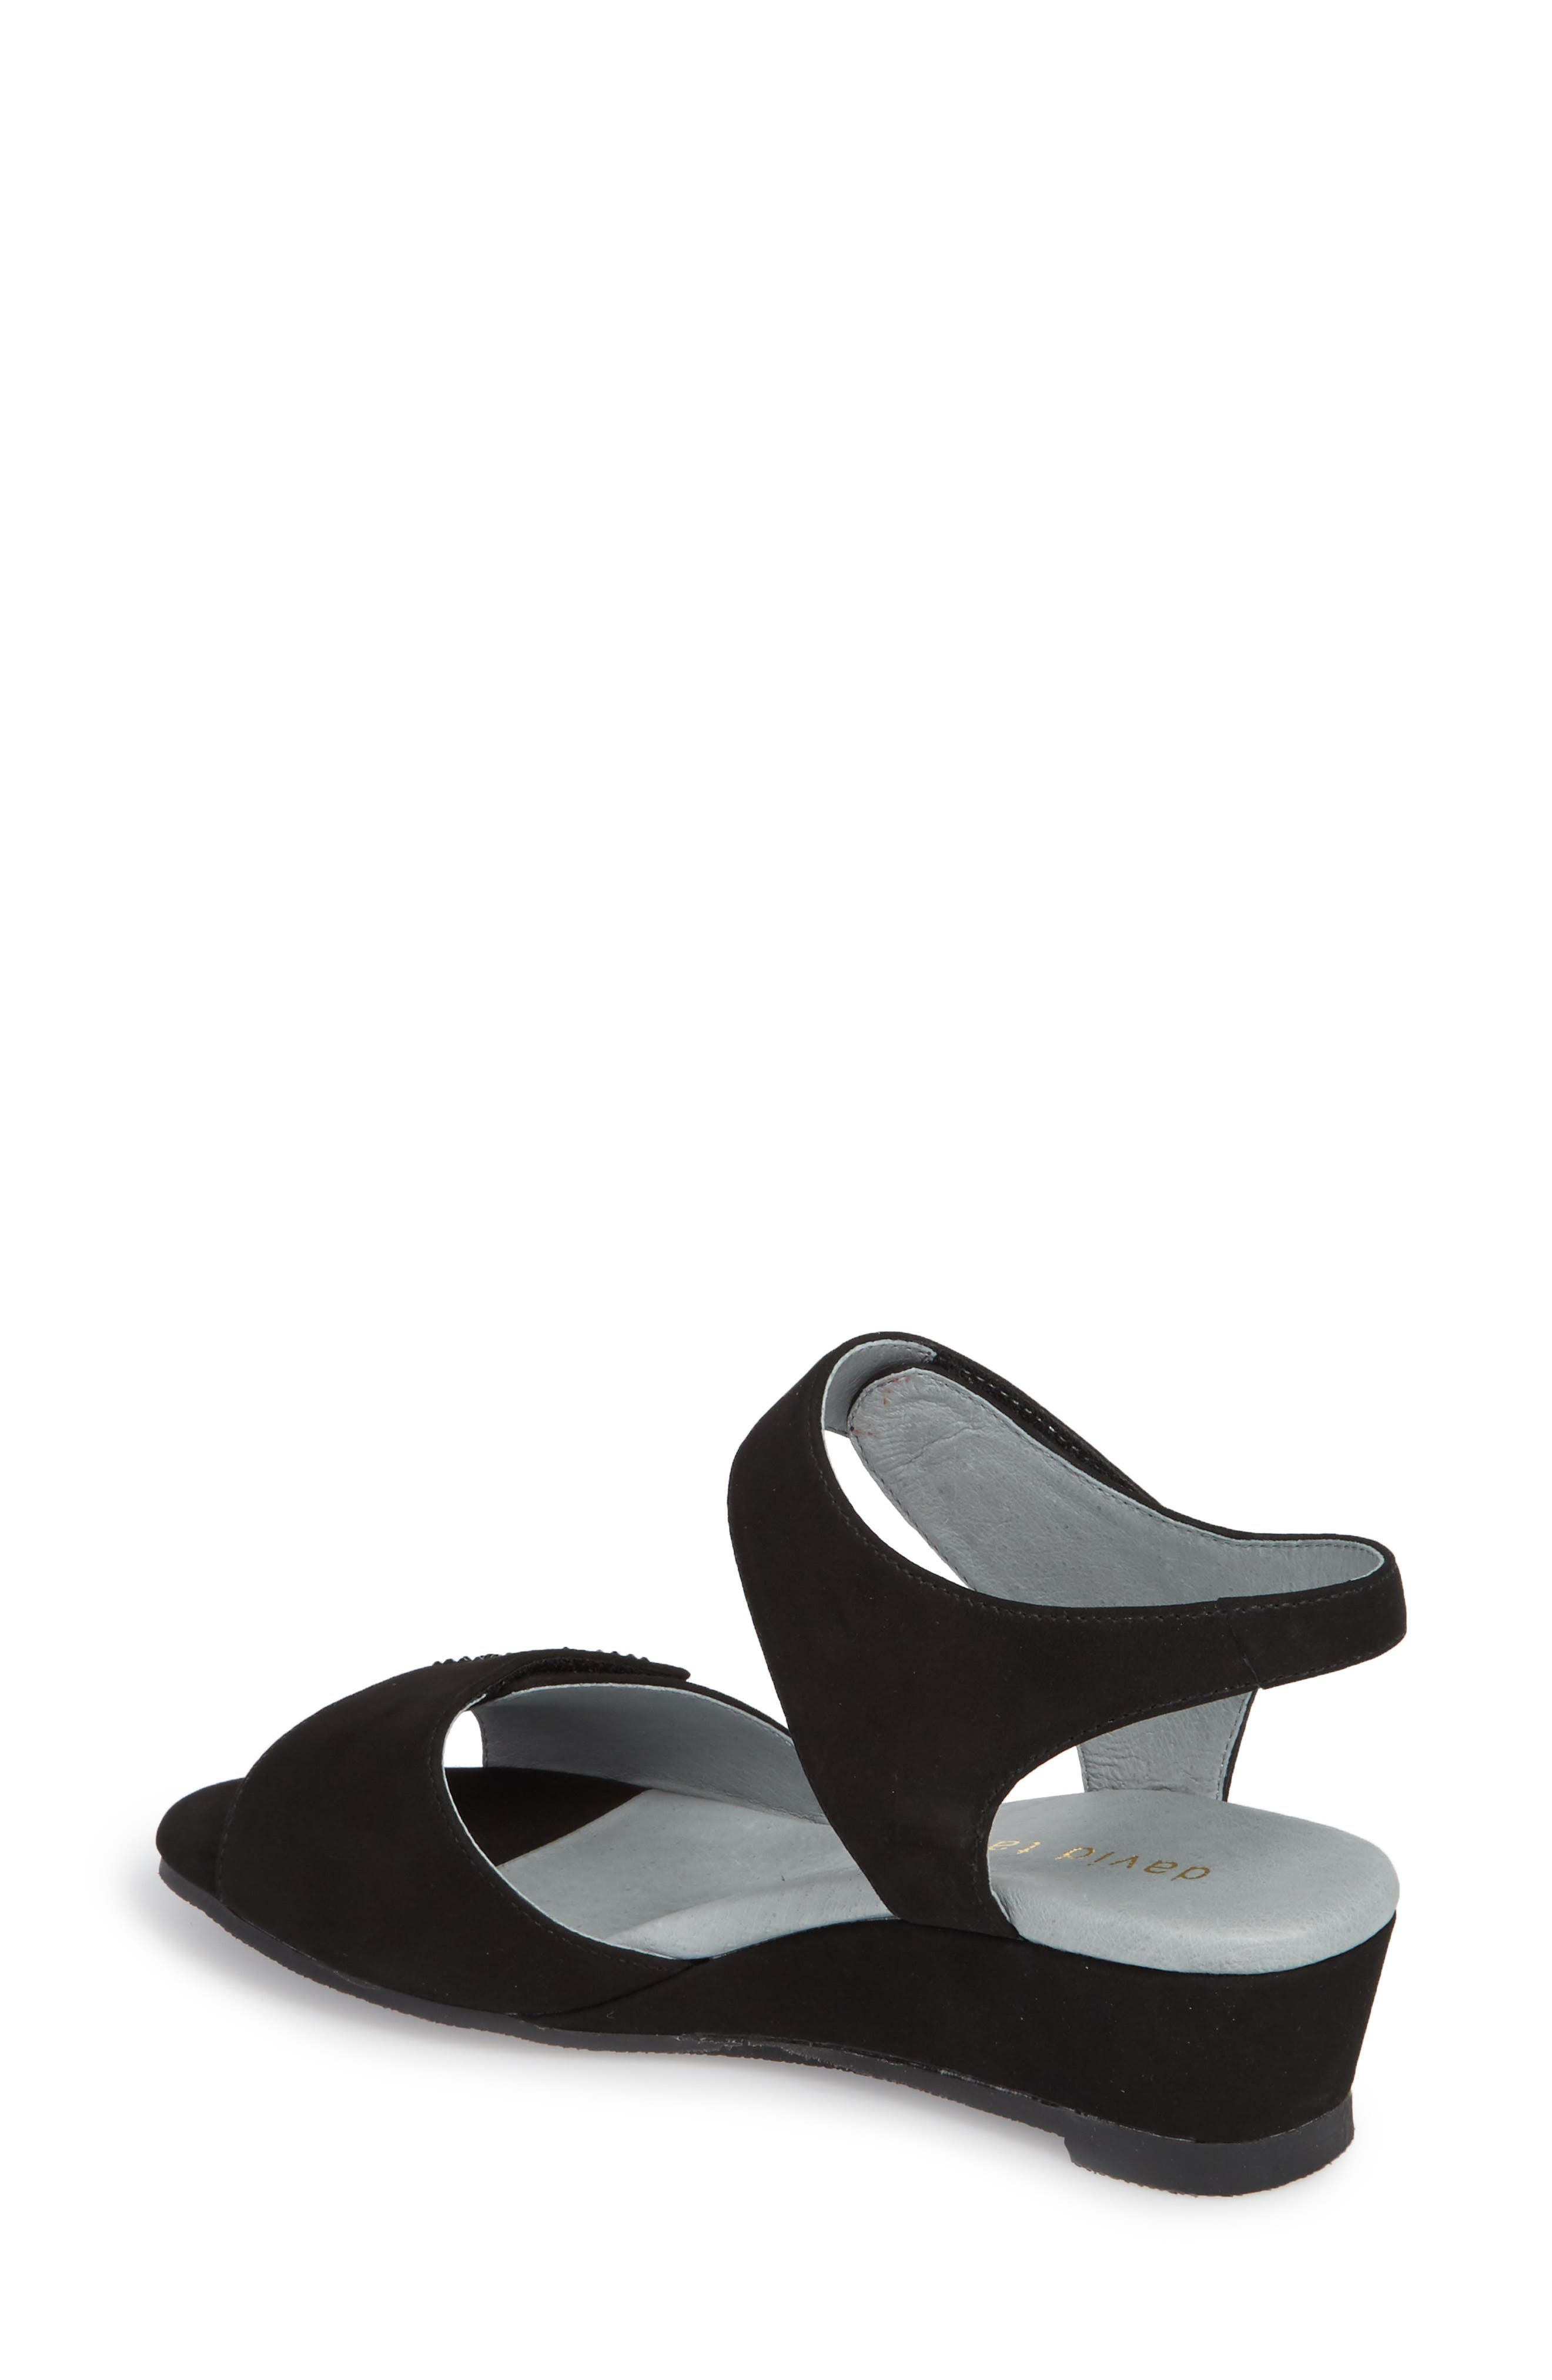 DAVID TATE, Queen Embellished Wedge Sandal, Alternate thumbnail 2, color, BLACK NUBUCK